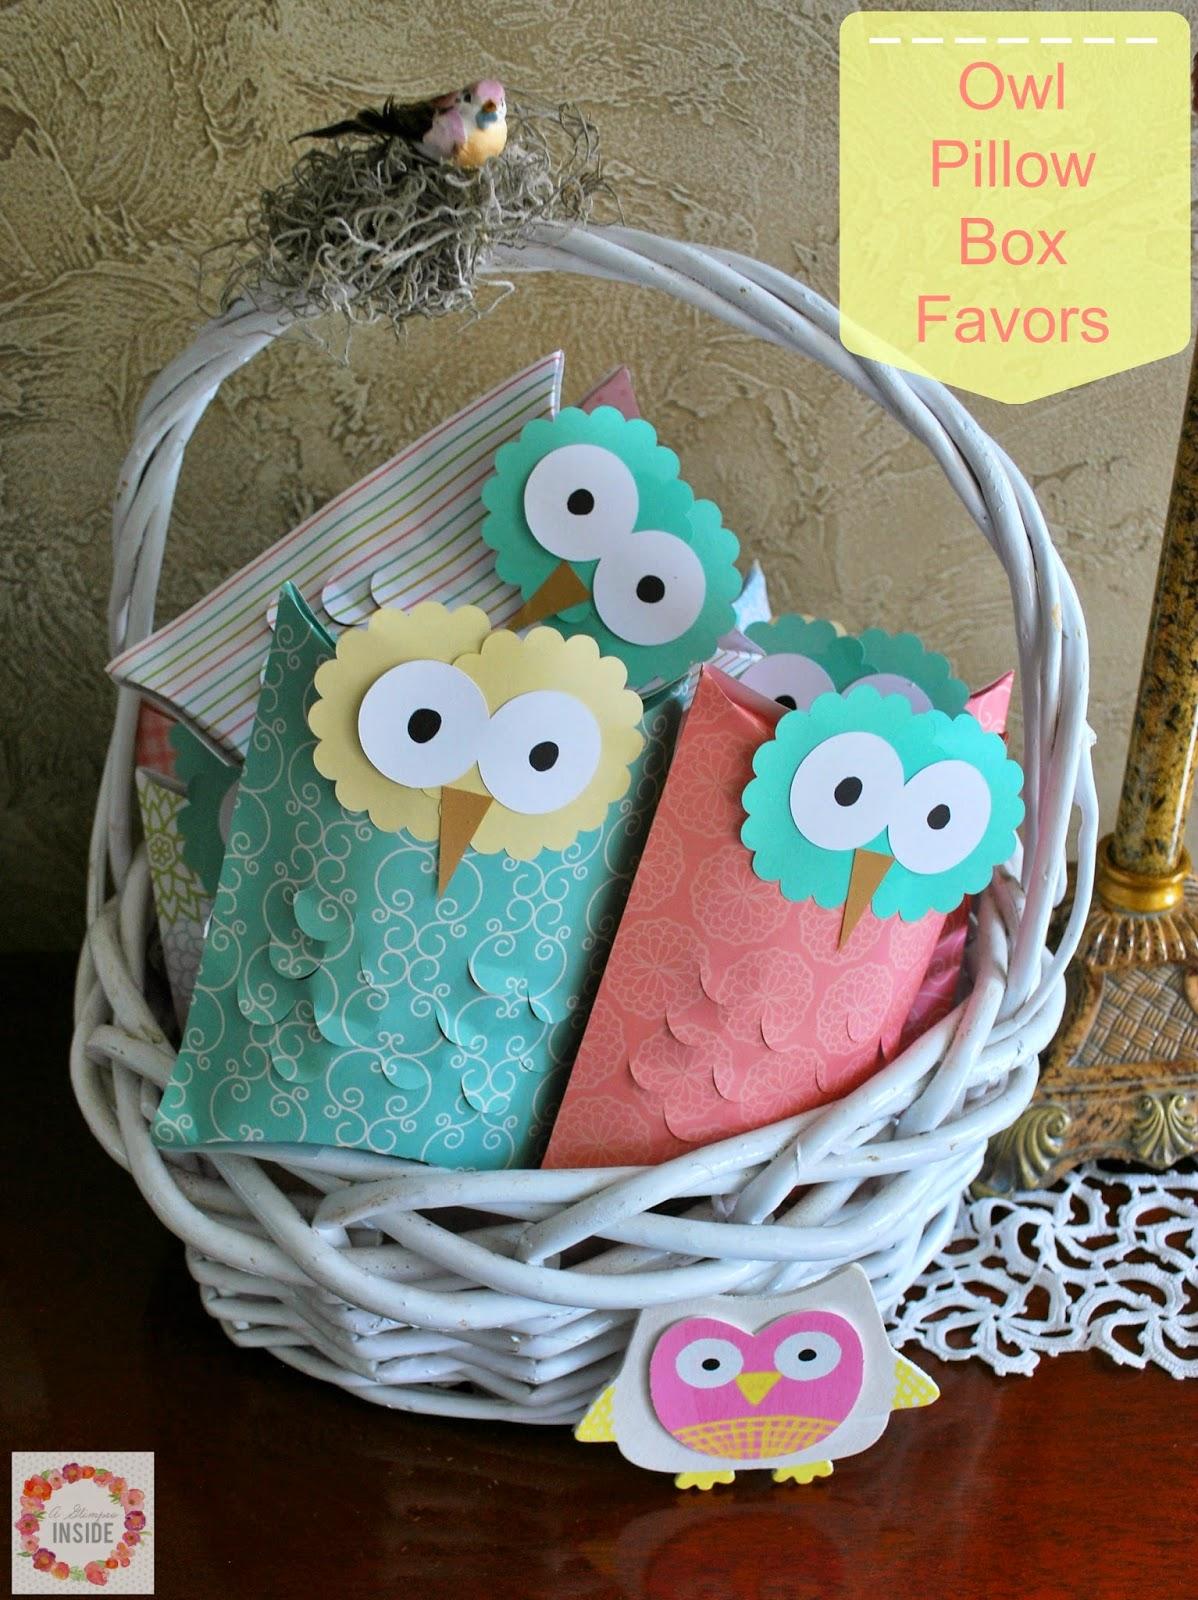 http://www.aglimpseinsideblog.com/2014/11/owl-pillow-box-favors.html